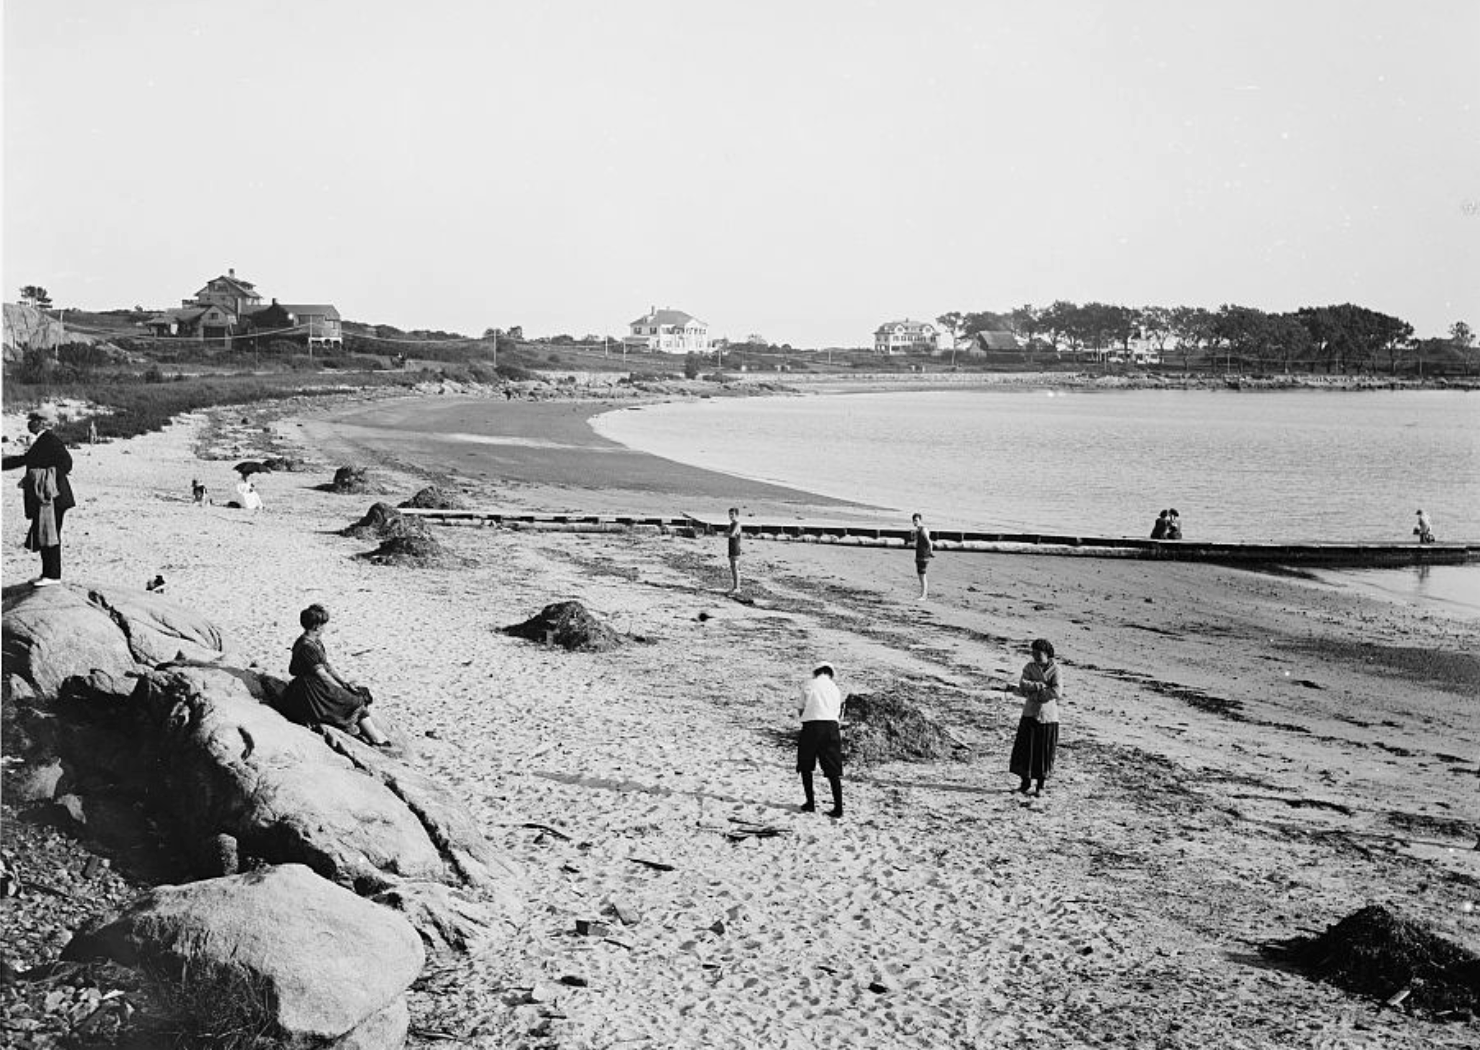 niles beach ca 1890